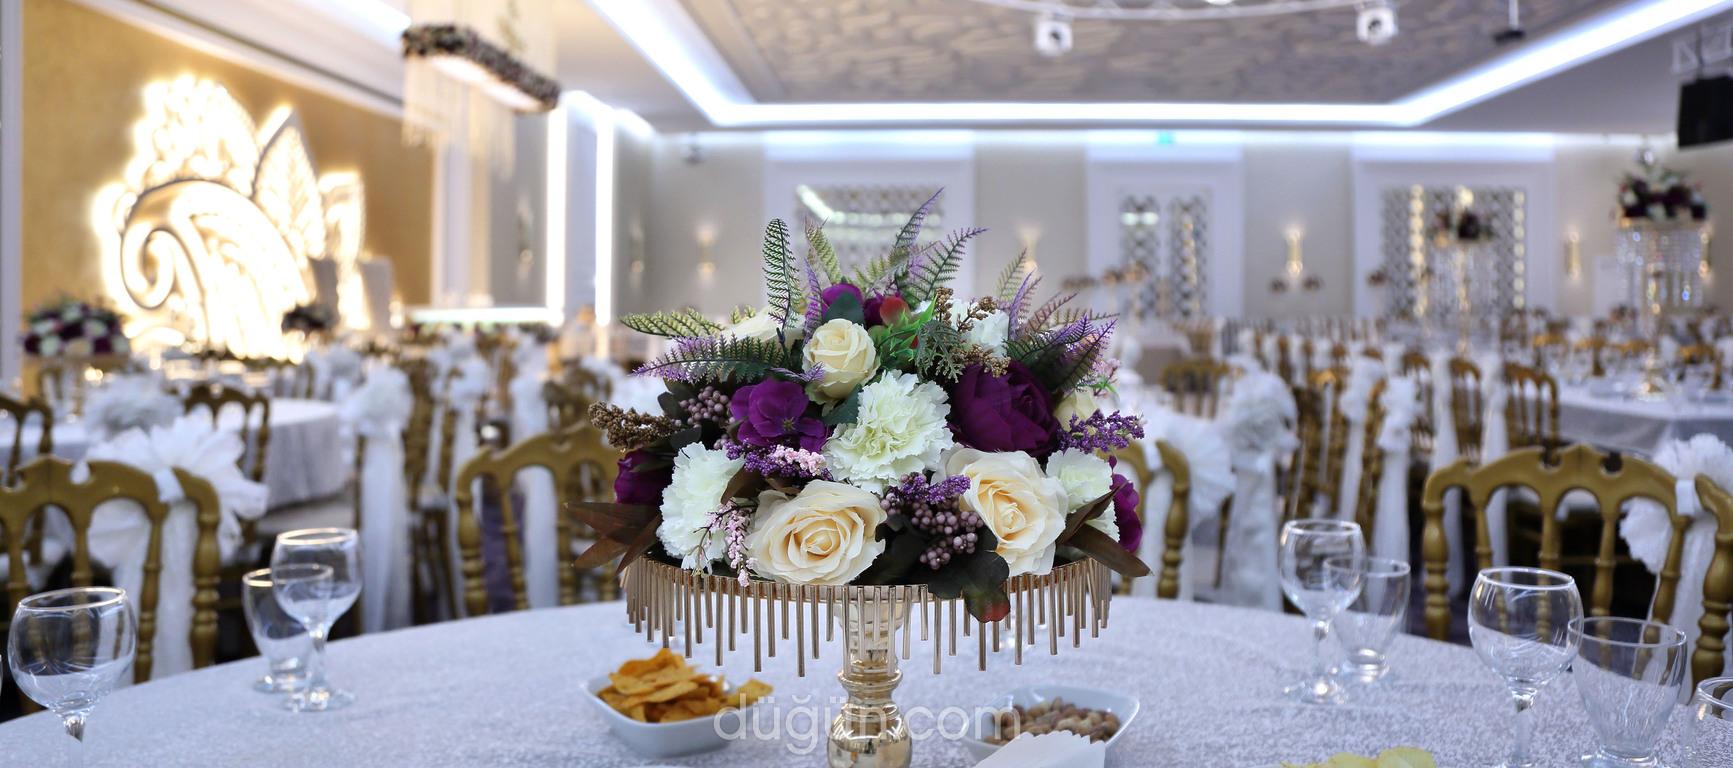 Queen Wedding Convention Hall